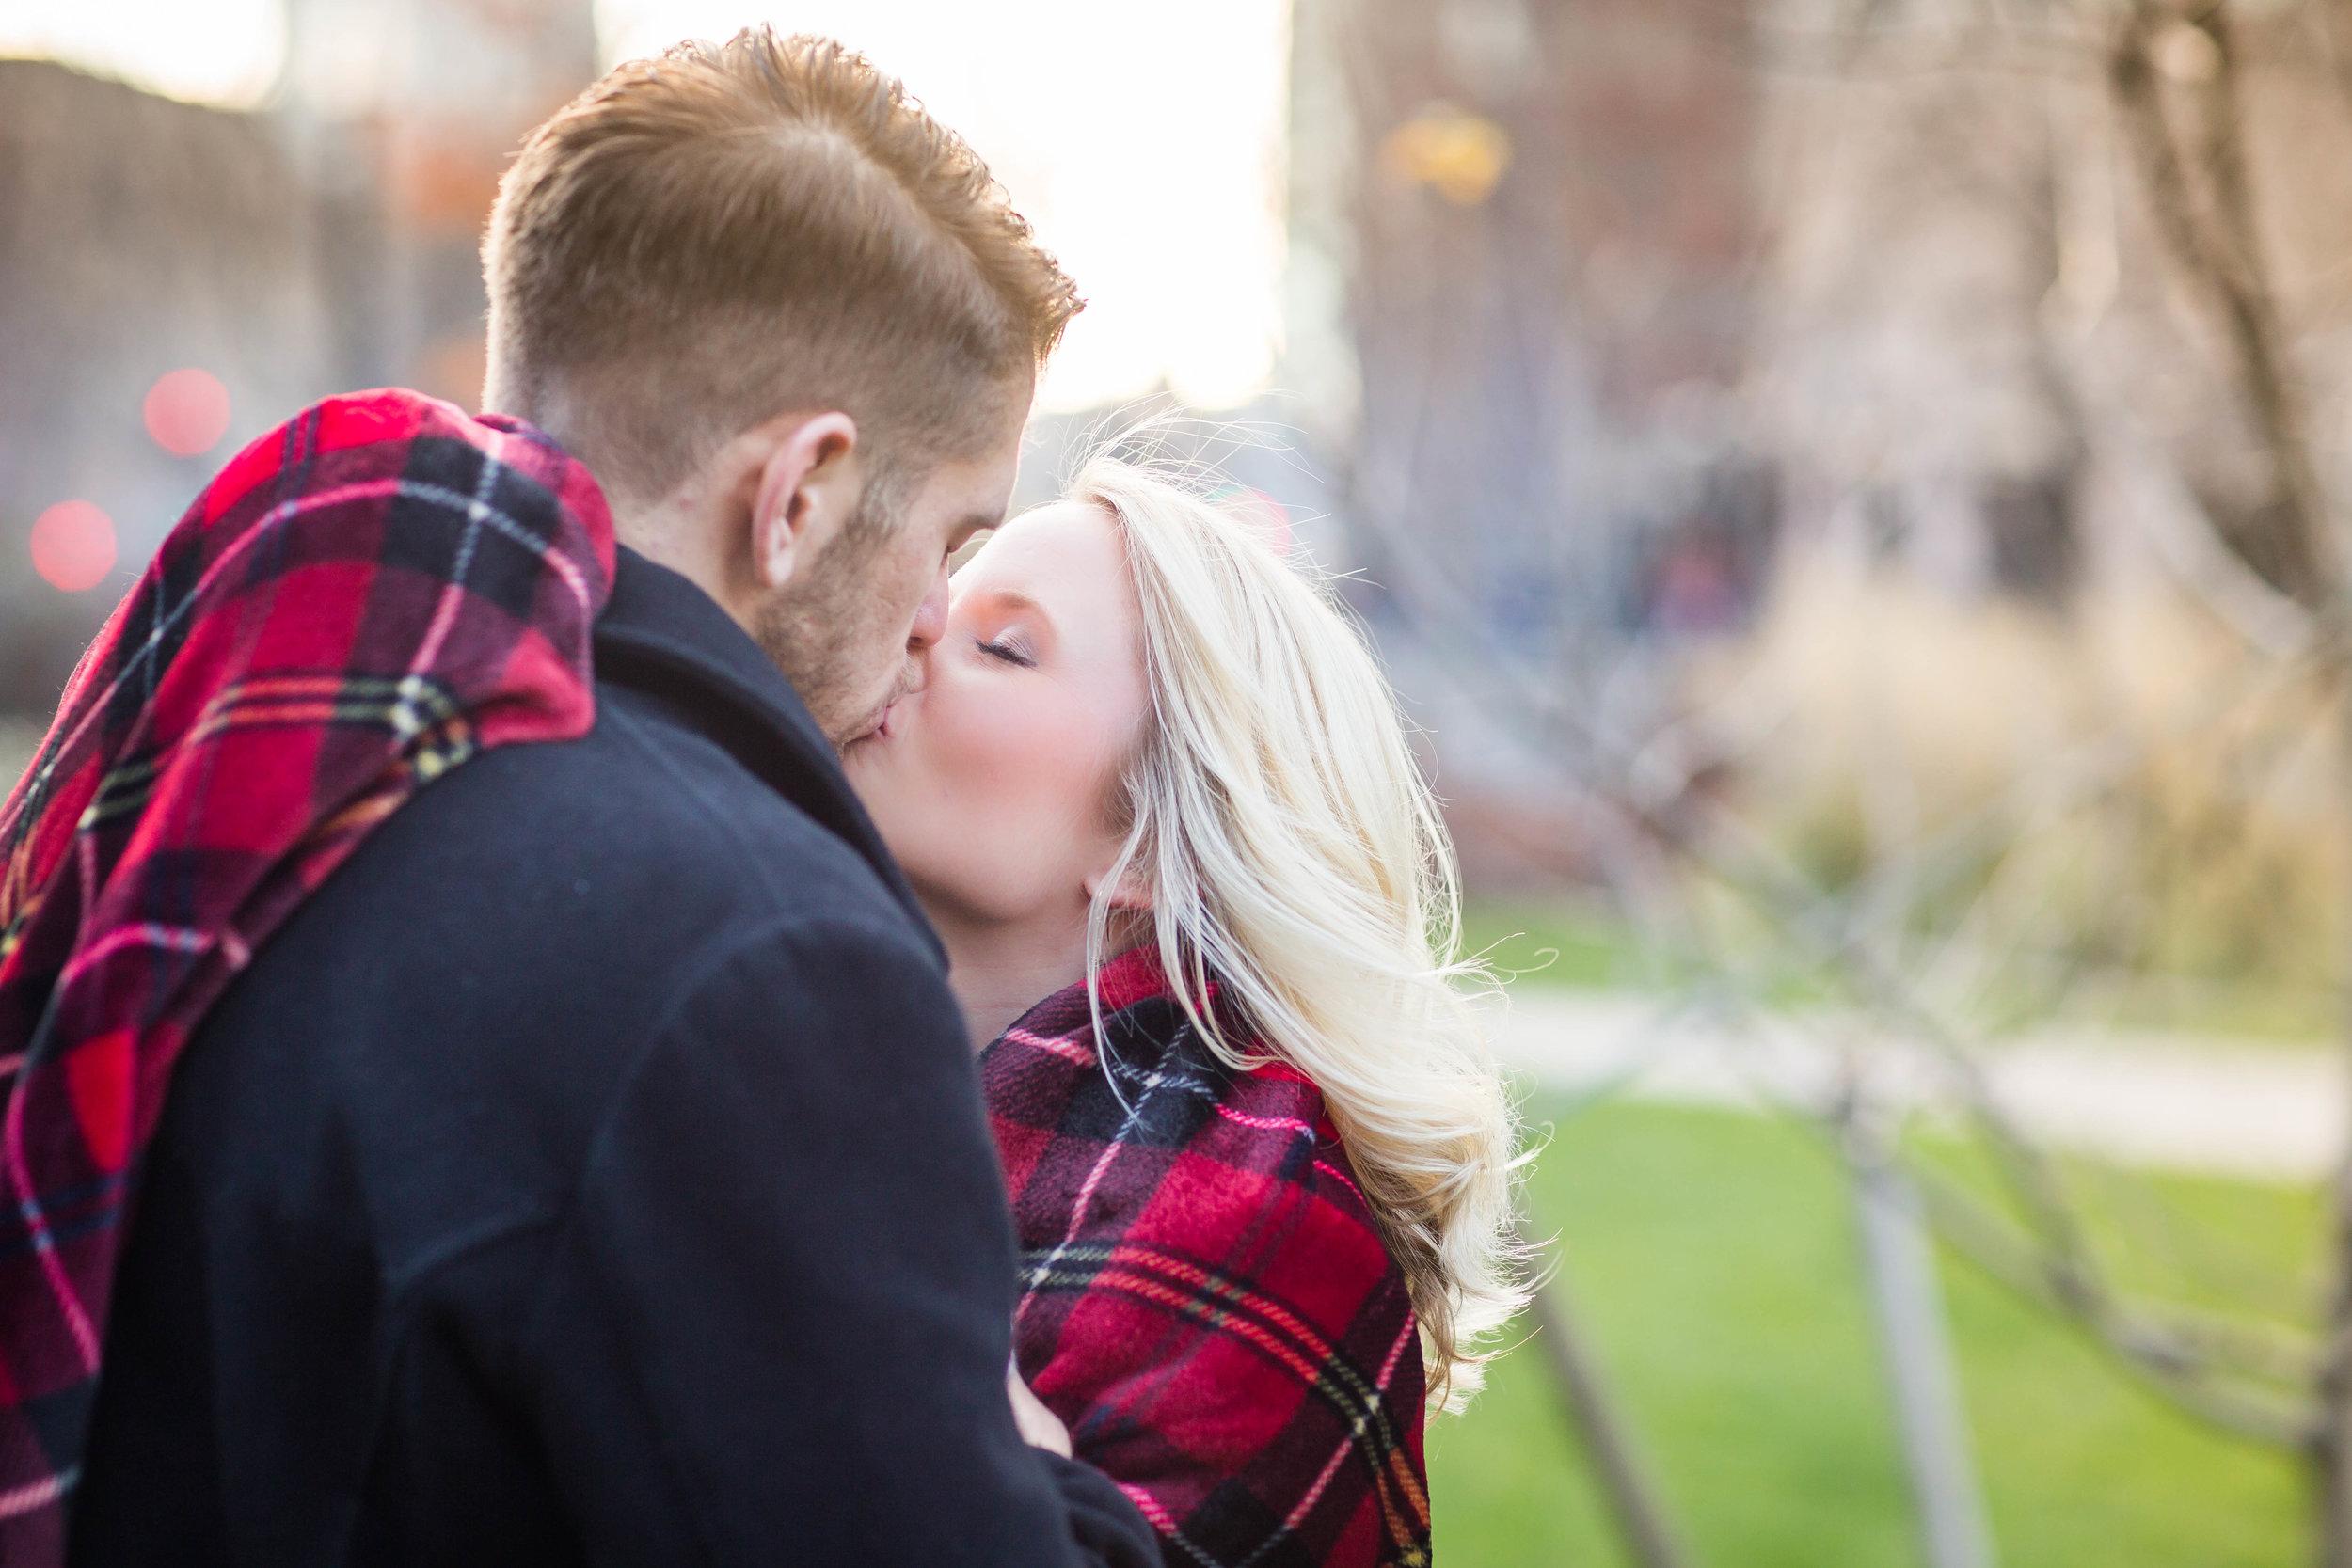 boston-picnic-engagement-session-photos